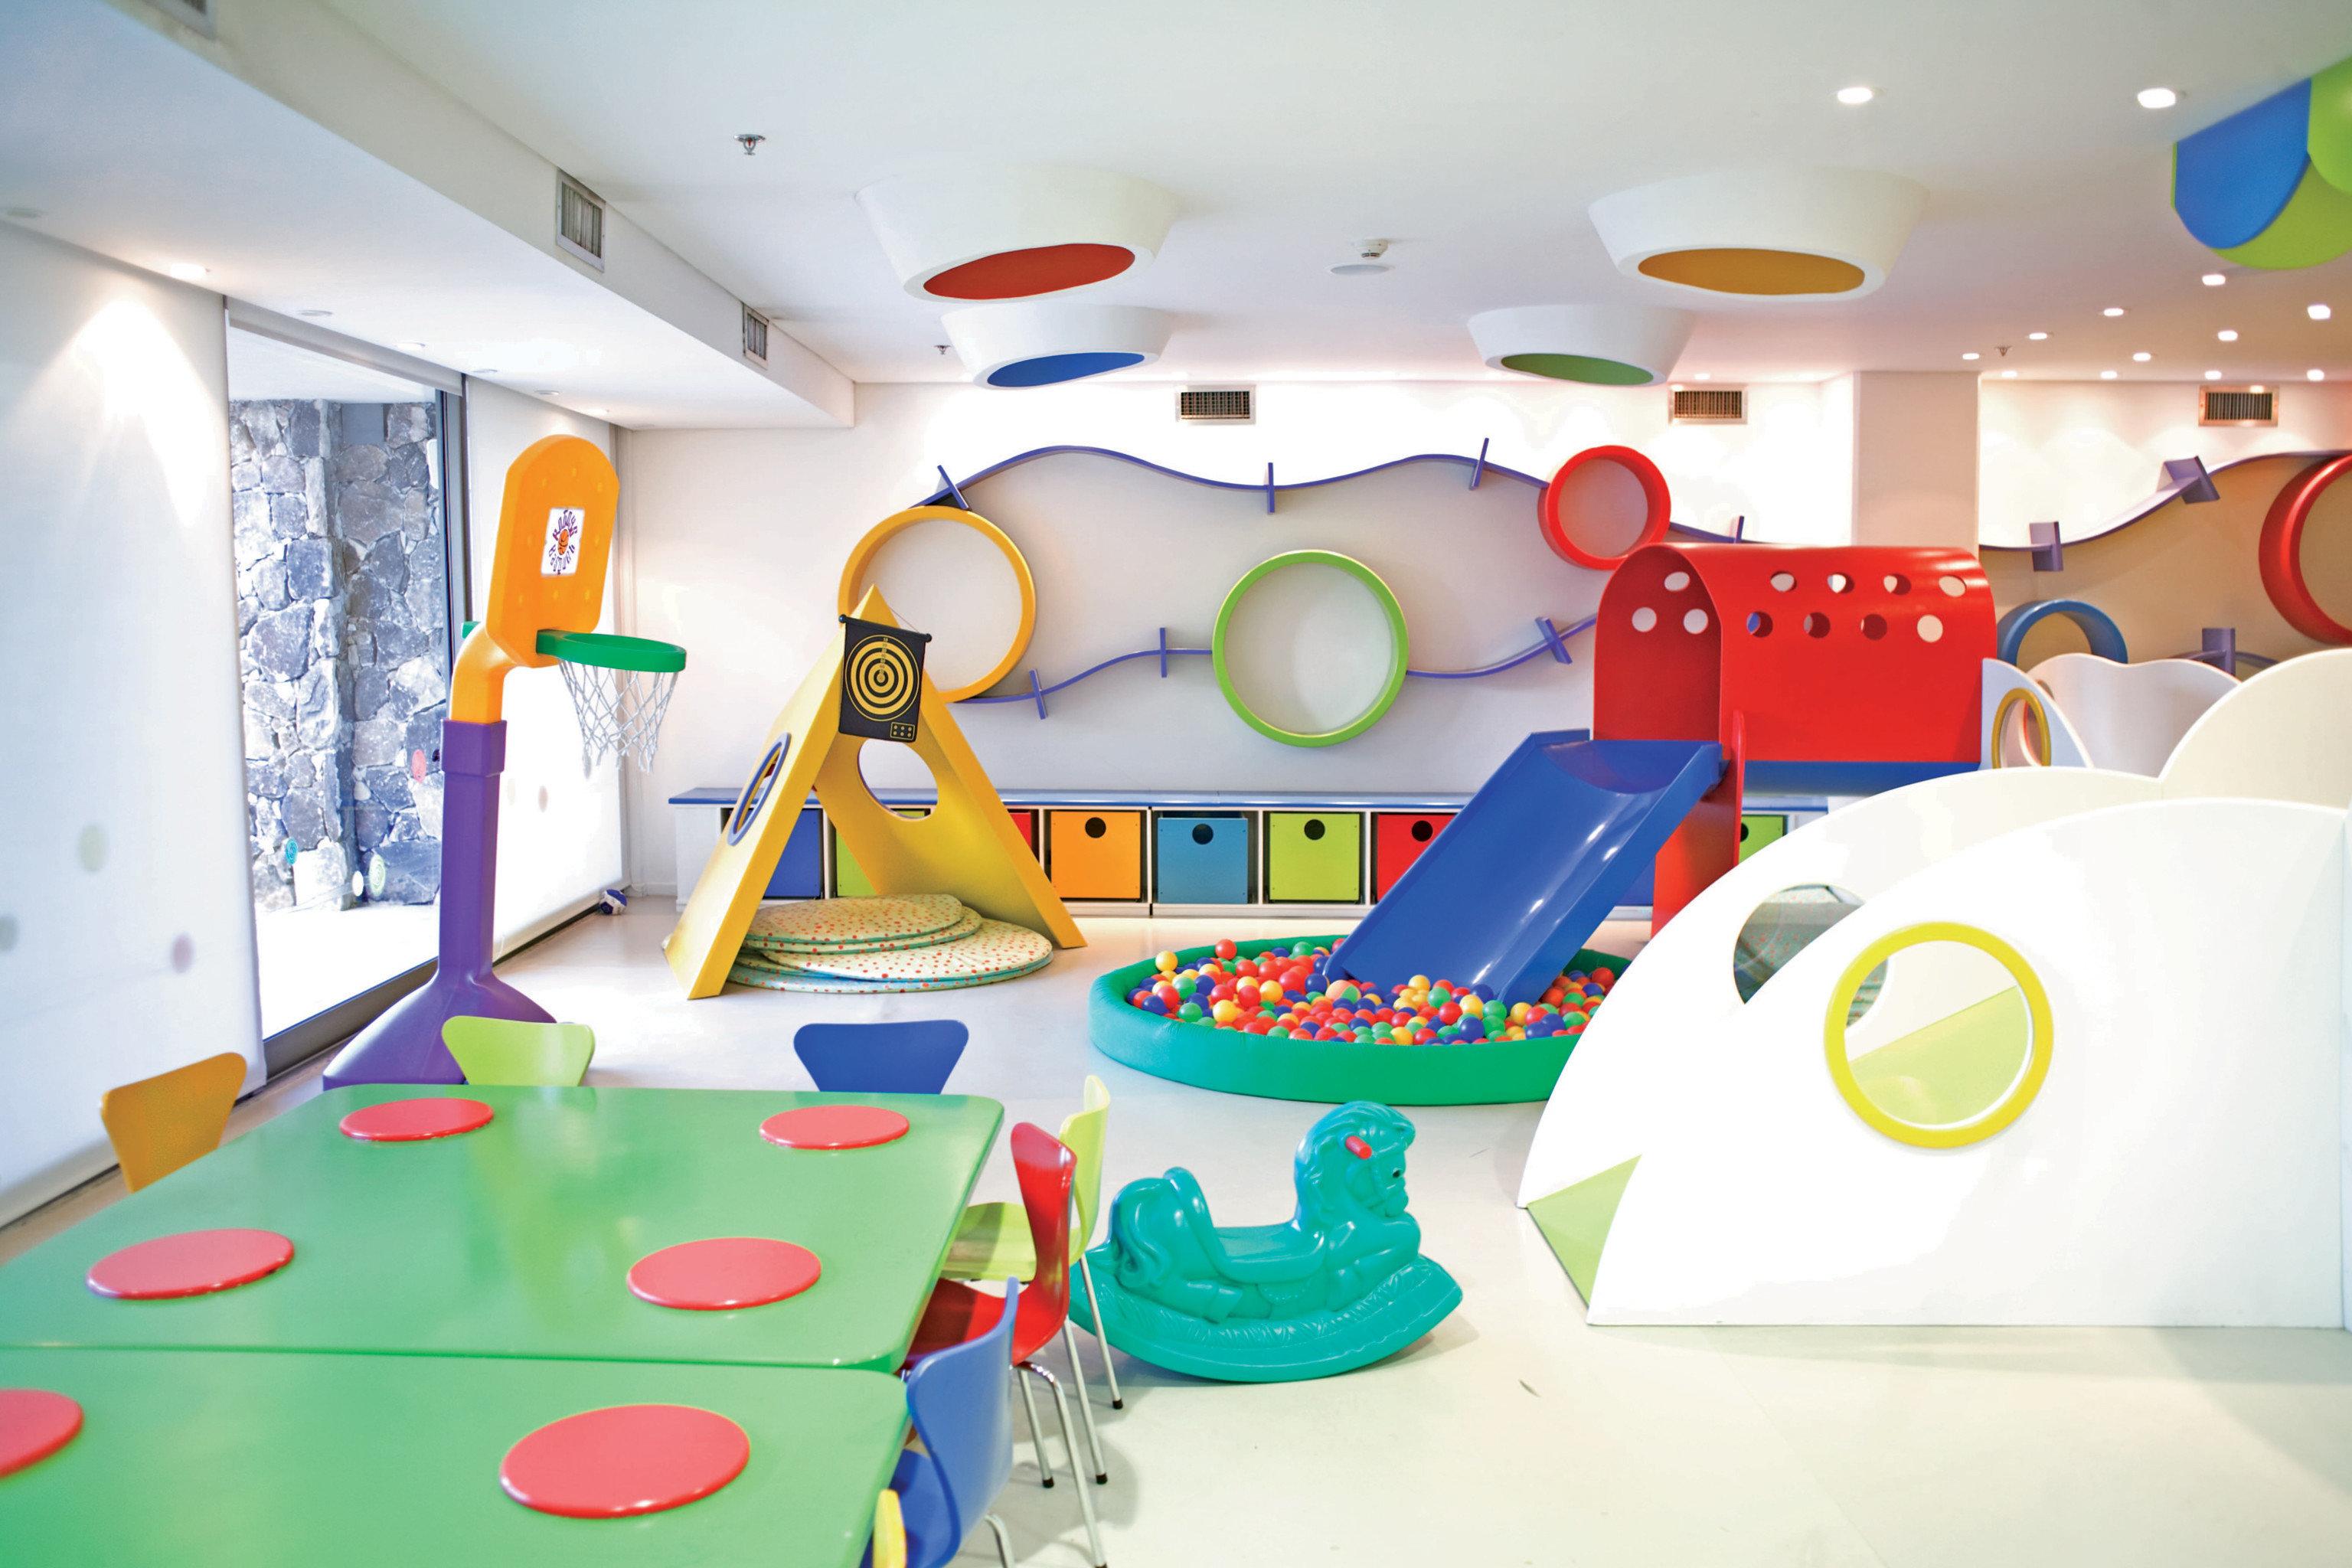 Entertainment Family Play leisure kindergarten classroom illustration mural toy Playground